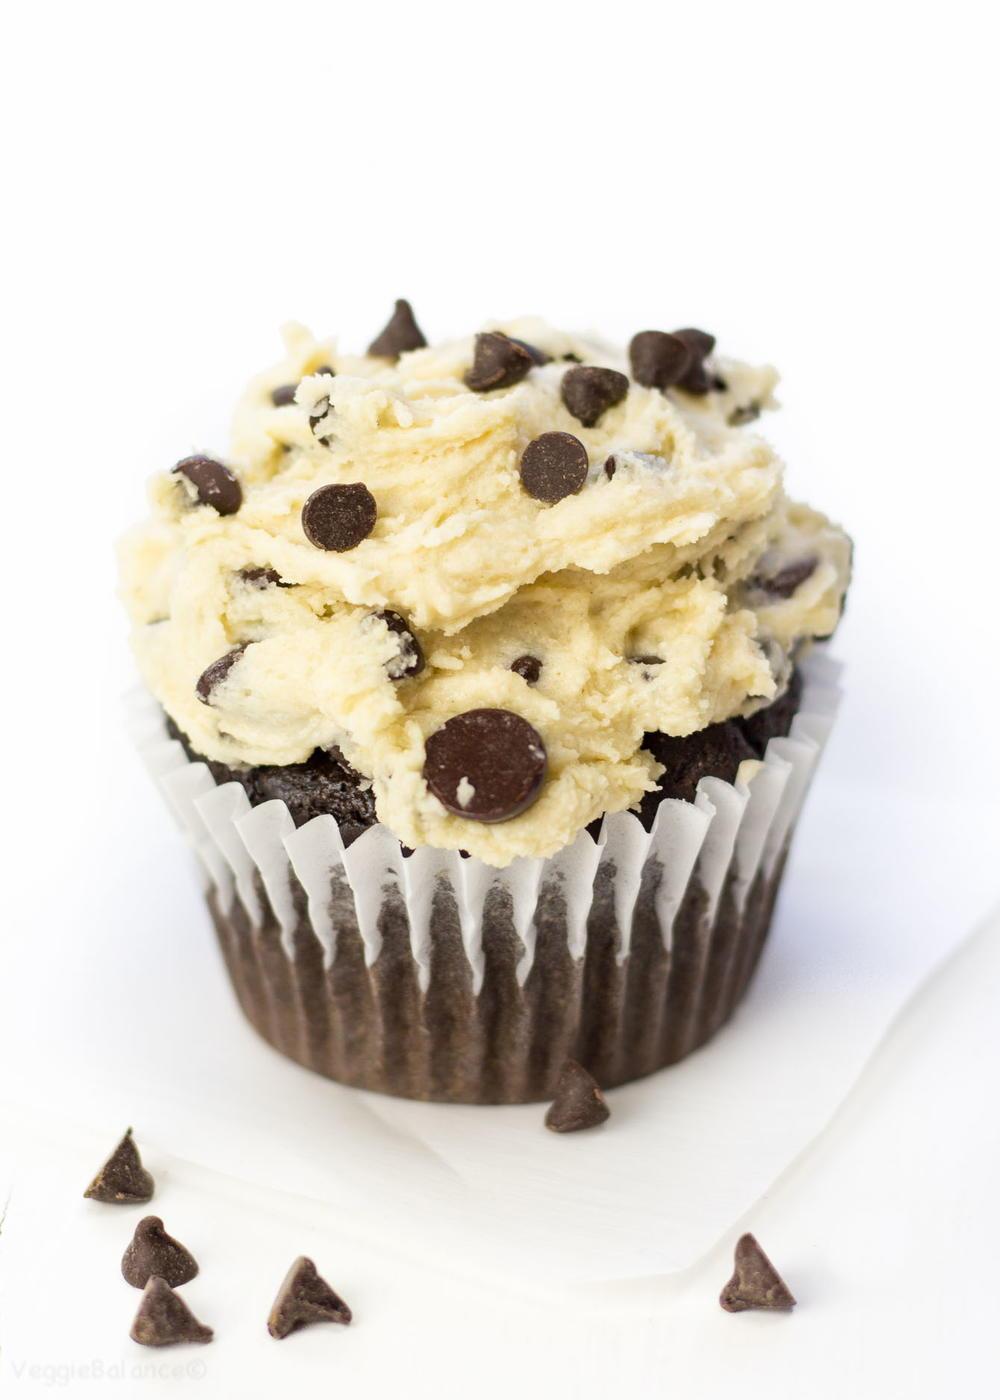 Cakeyboi: Chocolate Chocolate Chip Cupcakes with Cookie